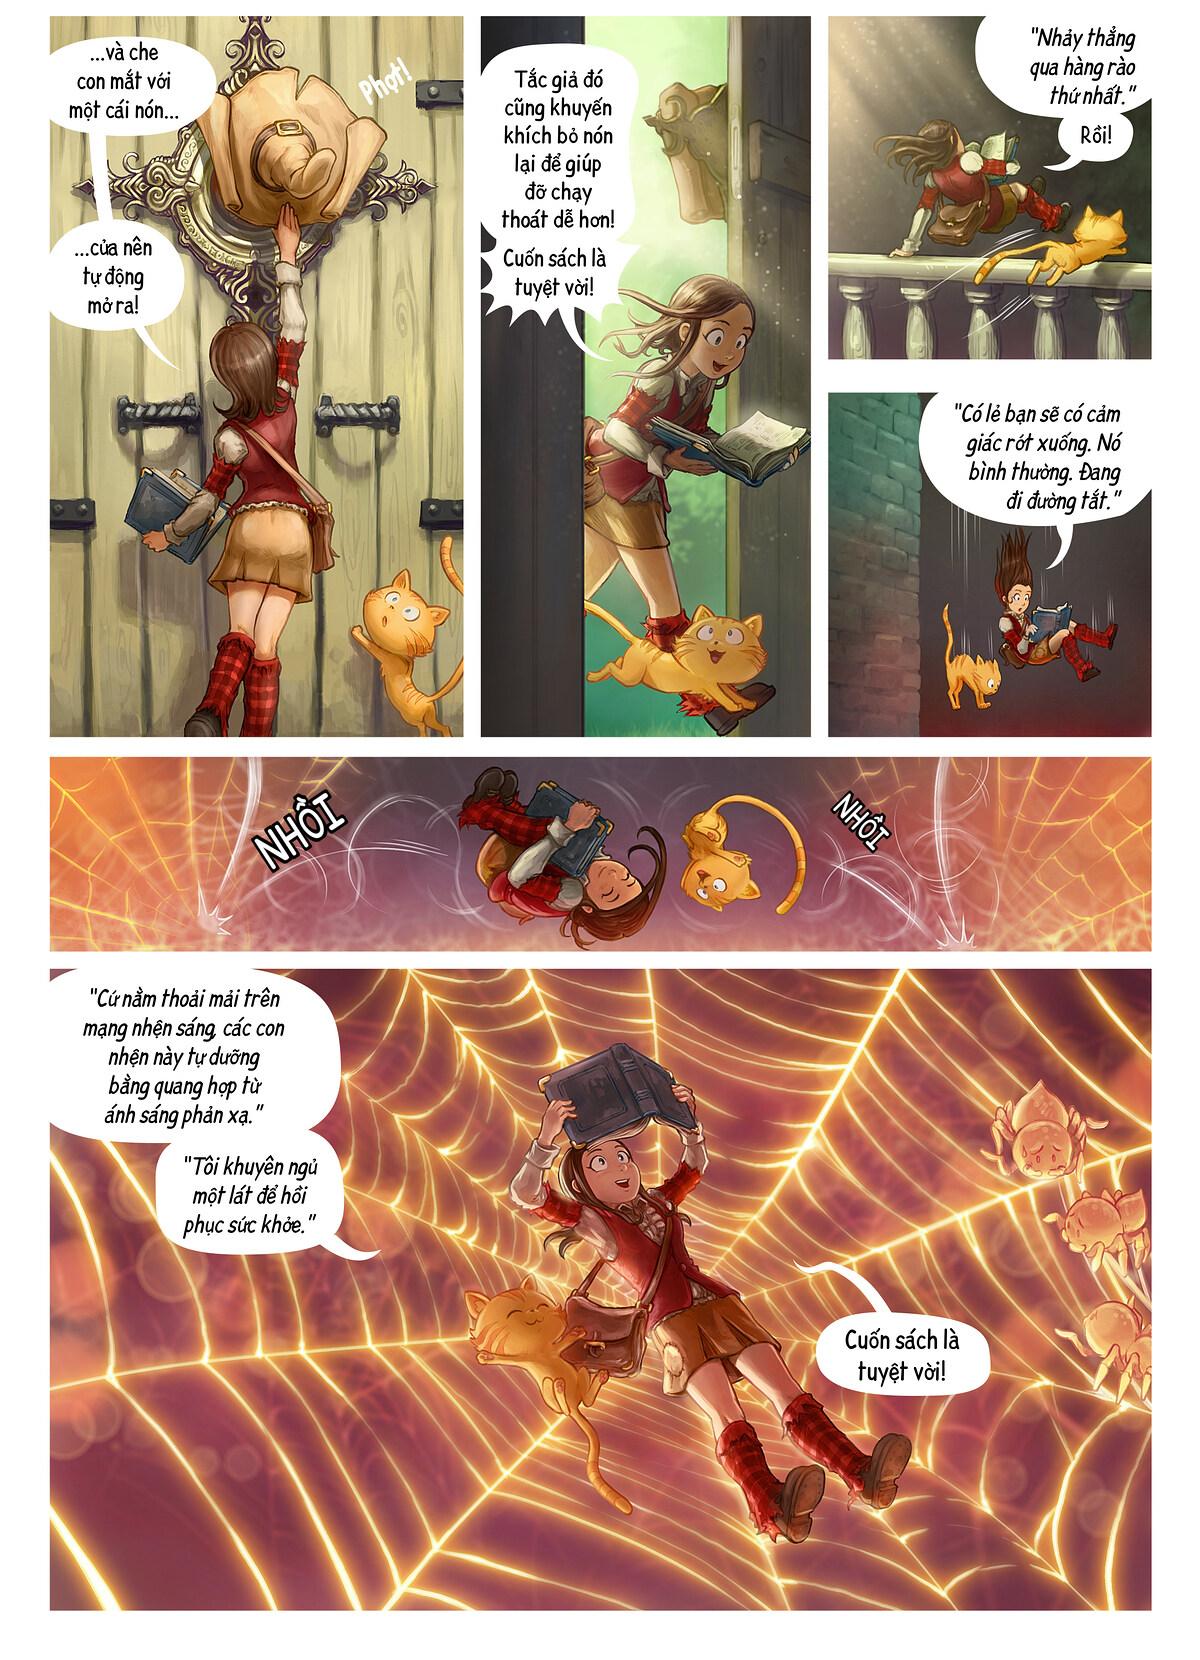 A webcomic page of Pepper&Carrot, Tập 26 [vi], trang 2